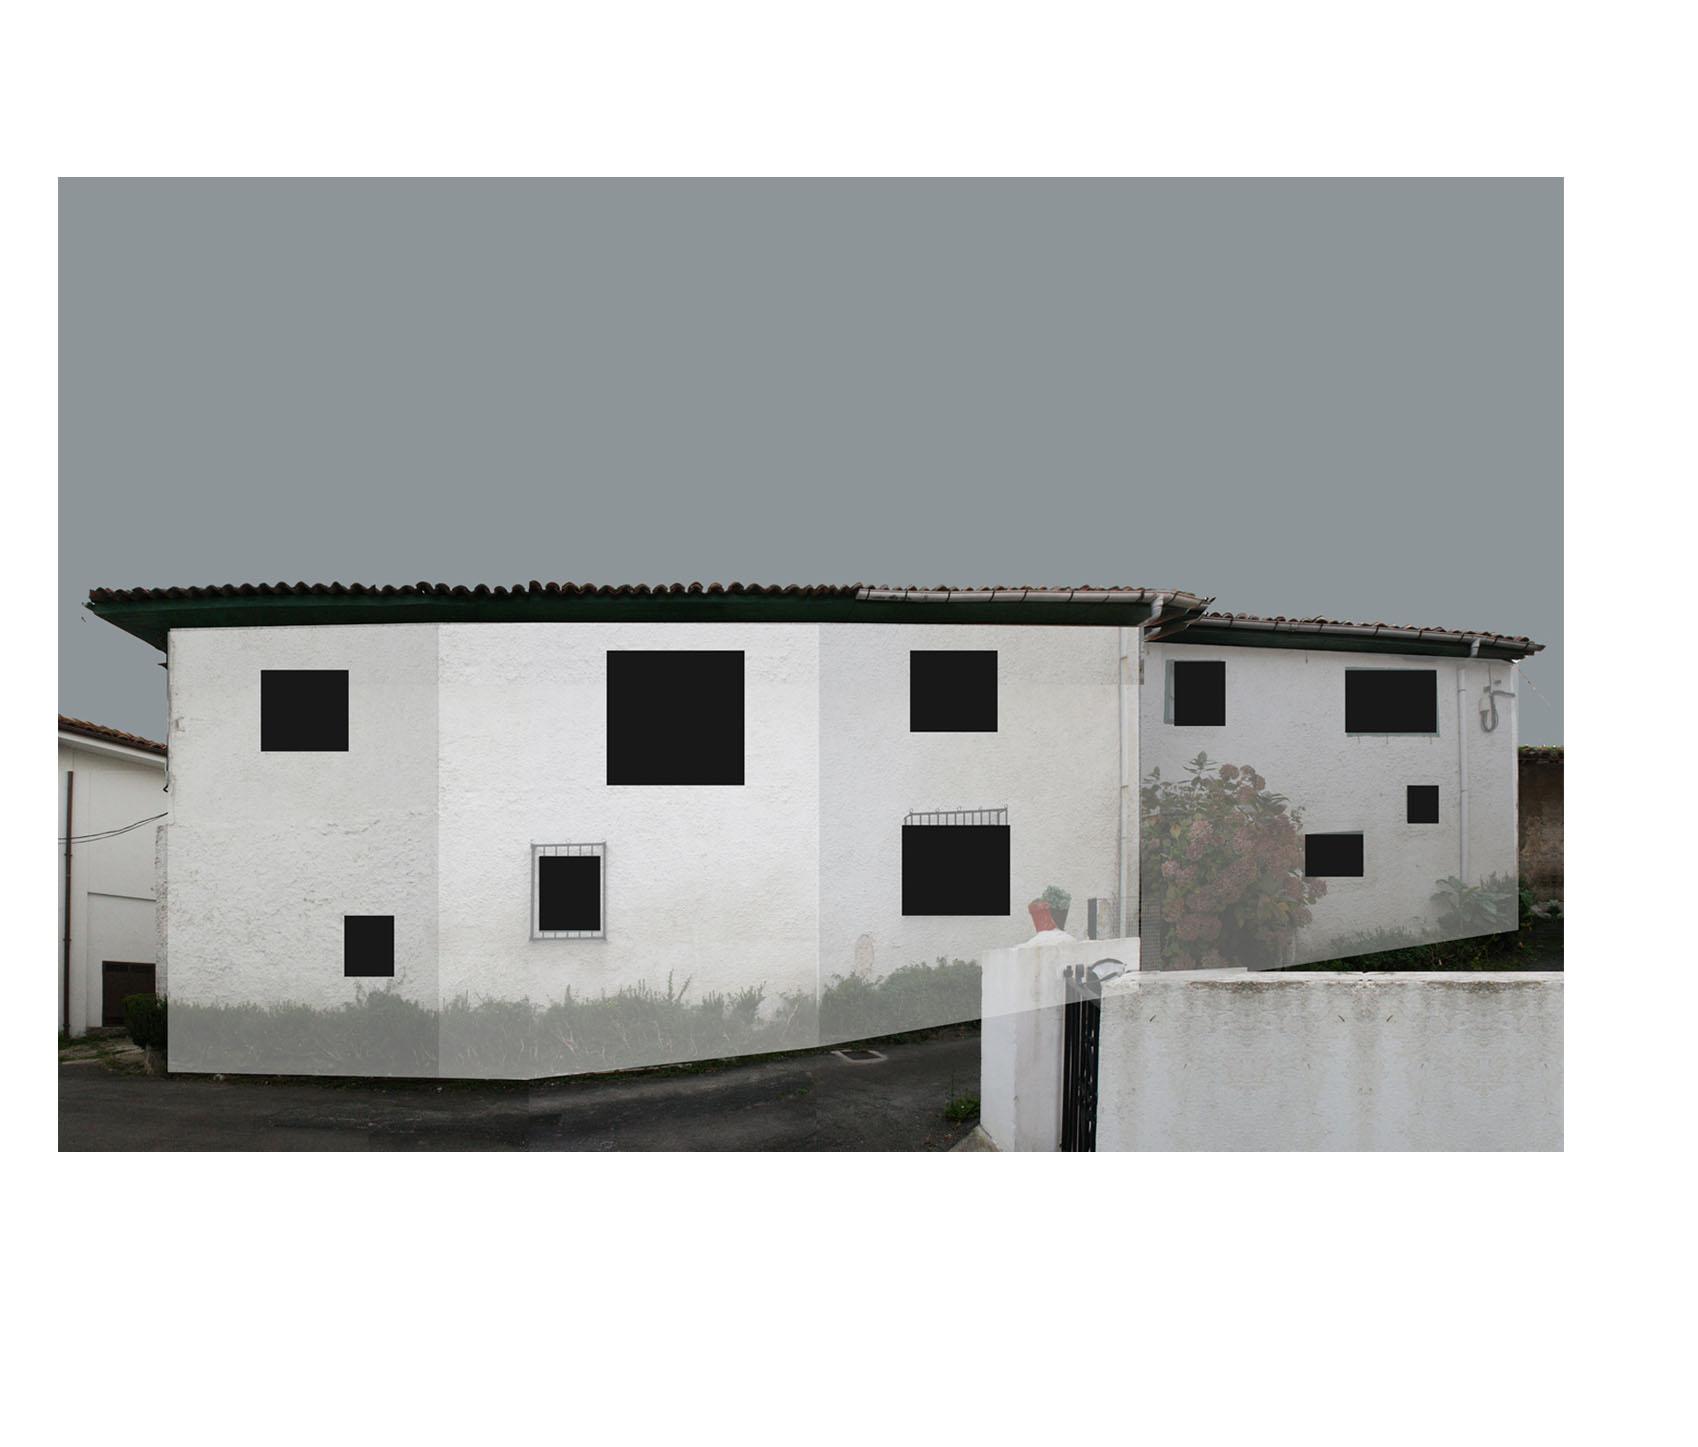 Private House-Celorio-Image 02.jpg